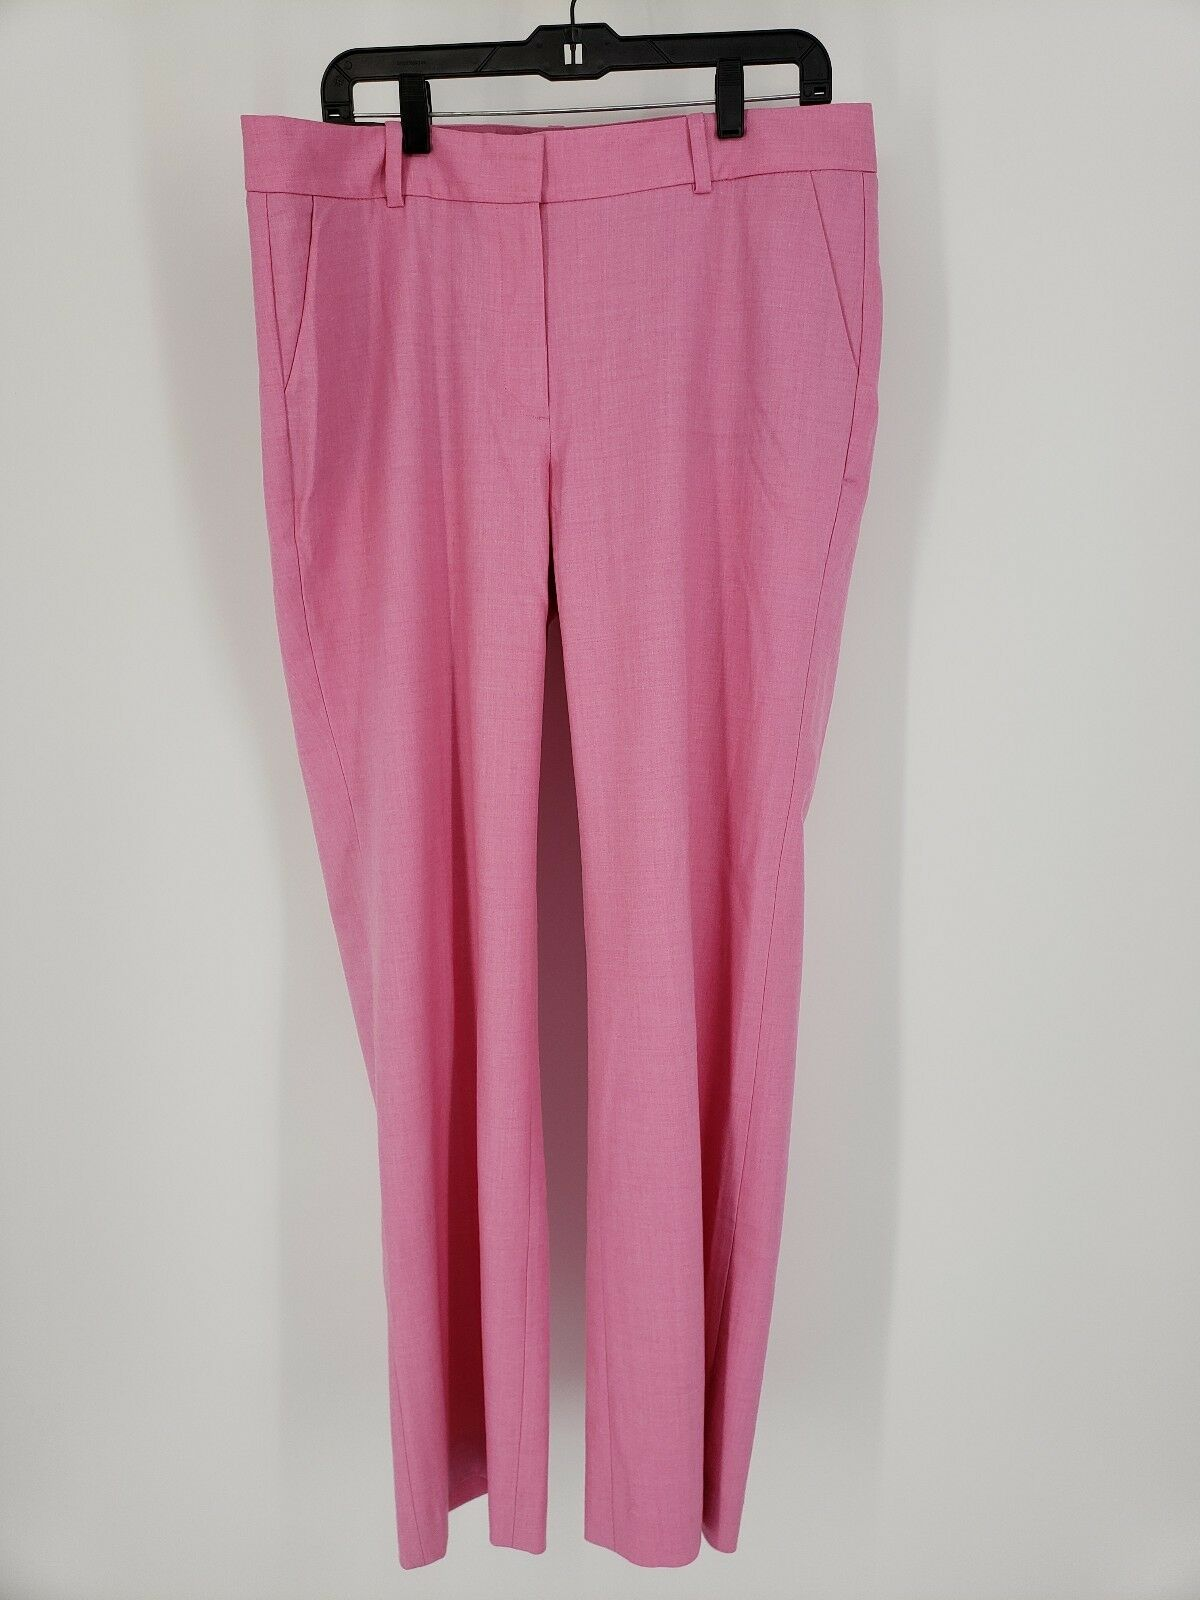 New J. Crew Stretch Dress Trouser Pants Pink Size 14 Wool Blend Style F7698